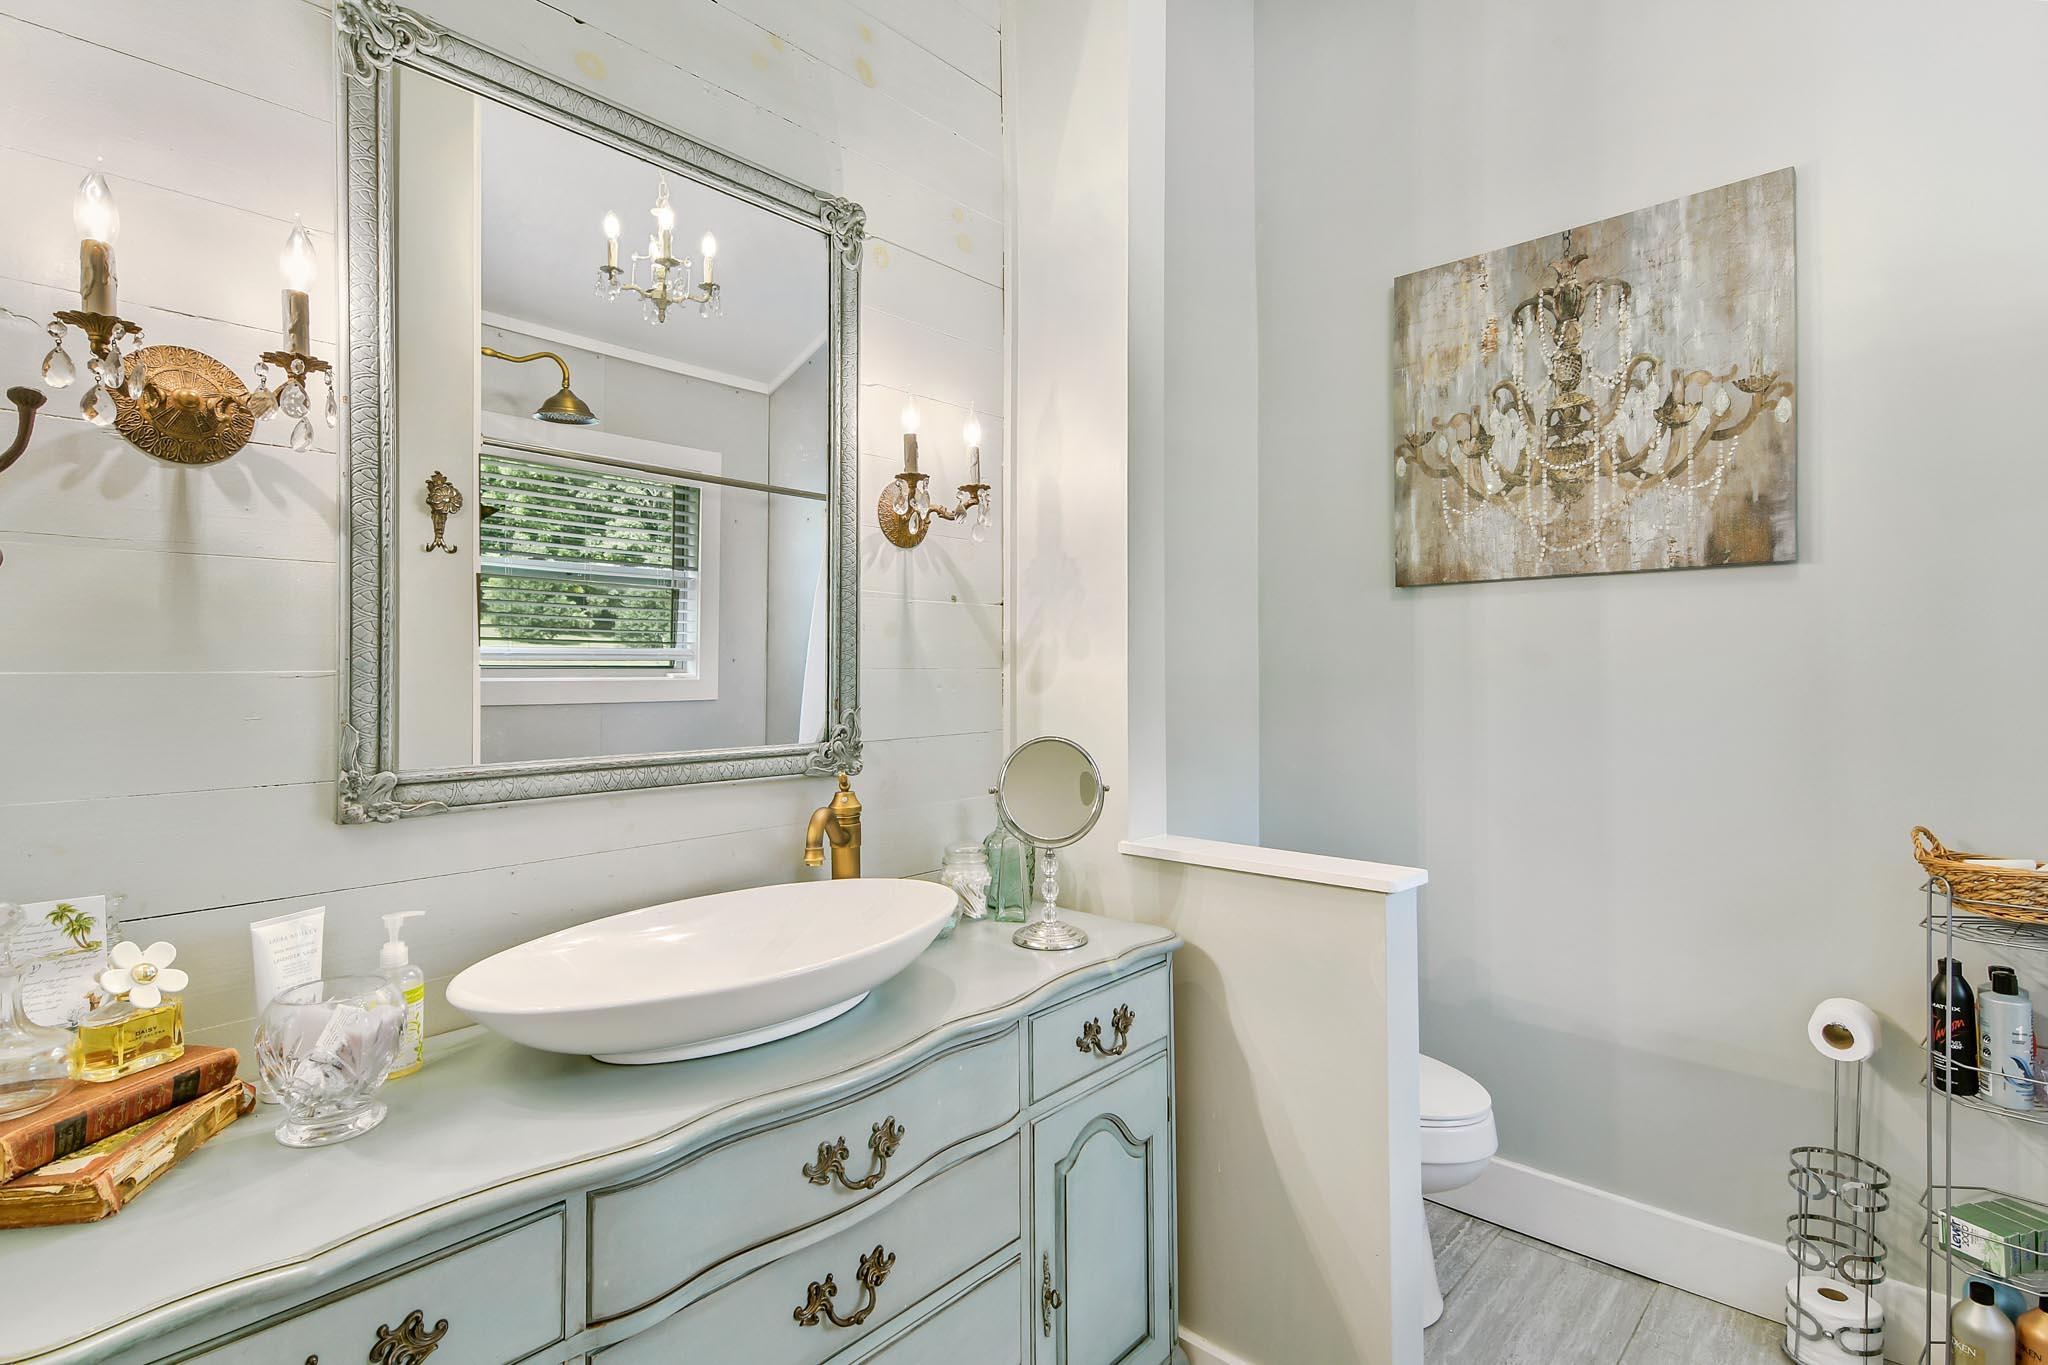 real_estate_photographer_bathroom_photography-12.jpg